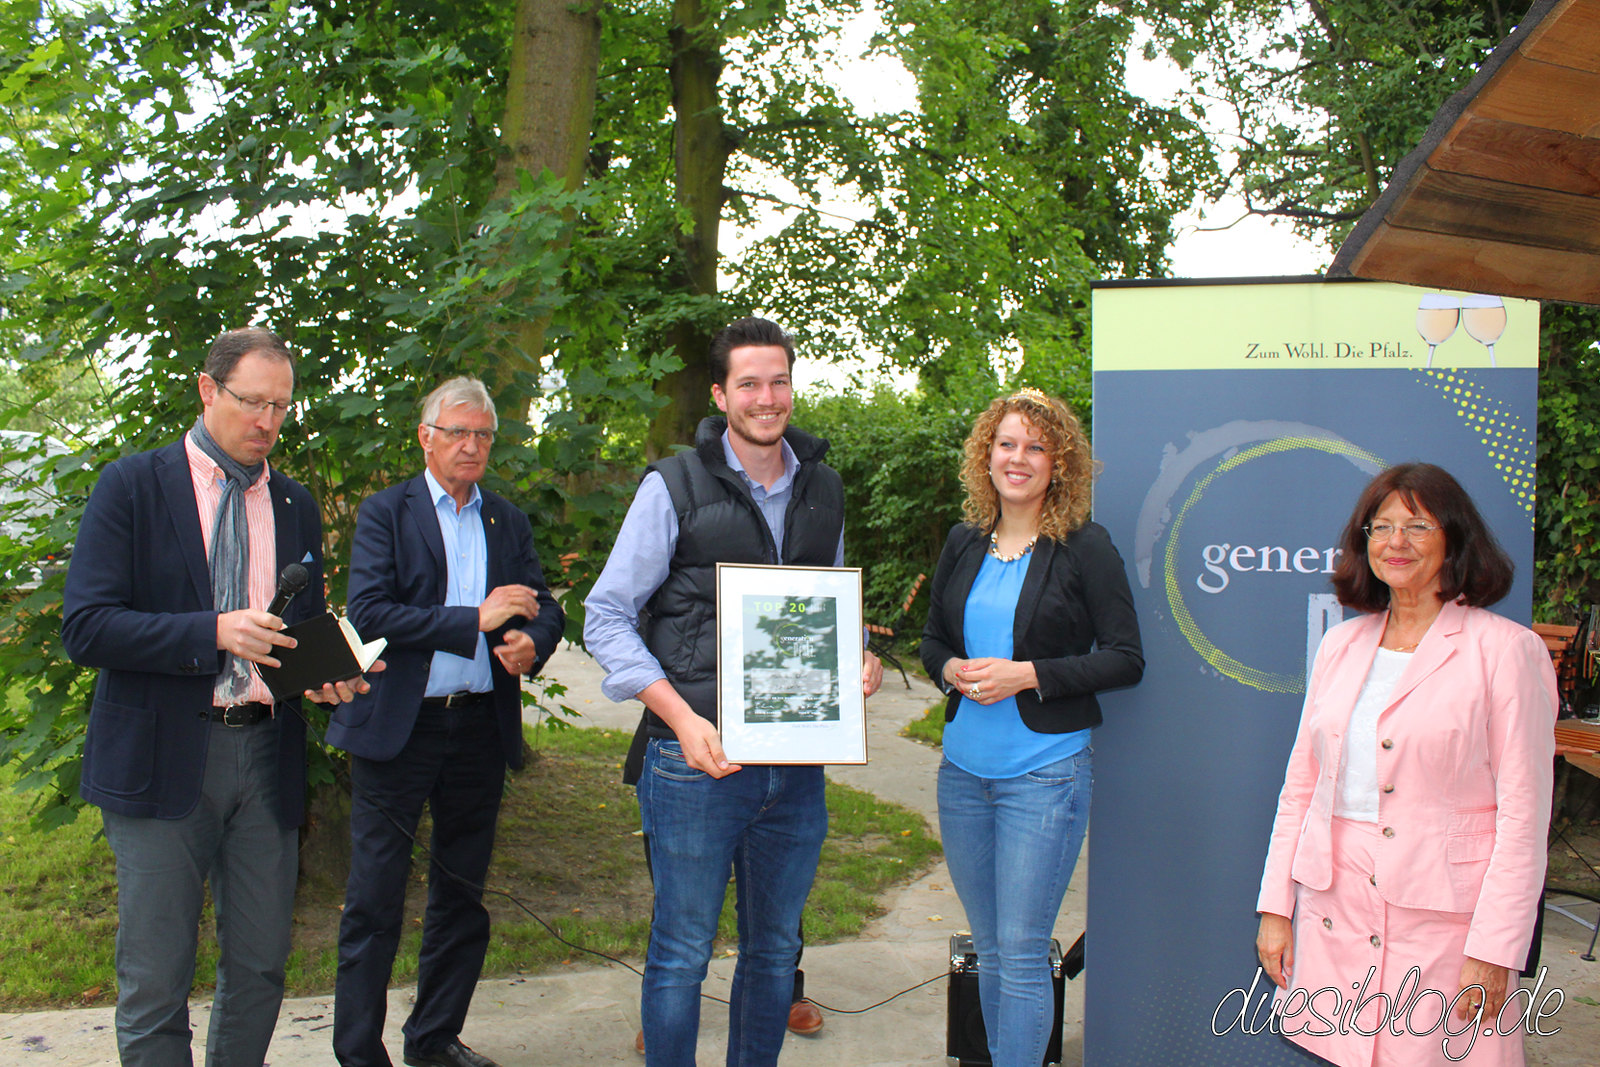 Generation Pfalz 2017 2018 duesiblog.de 20